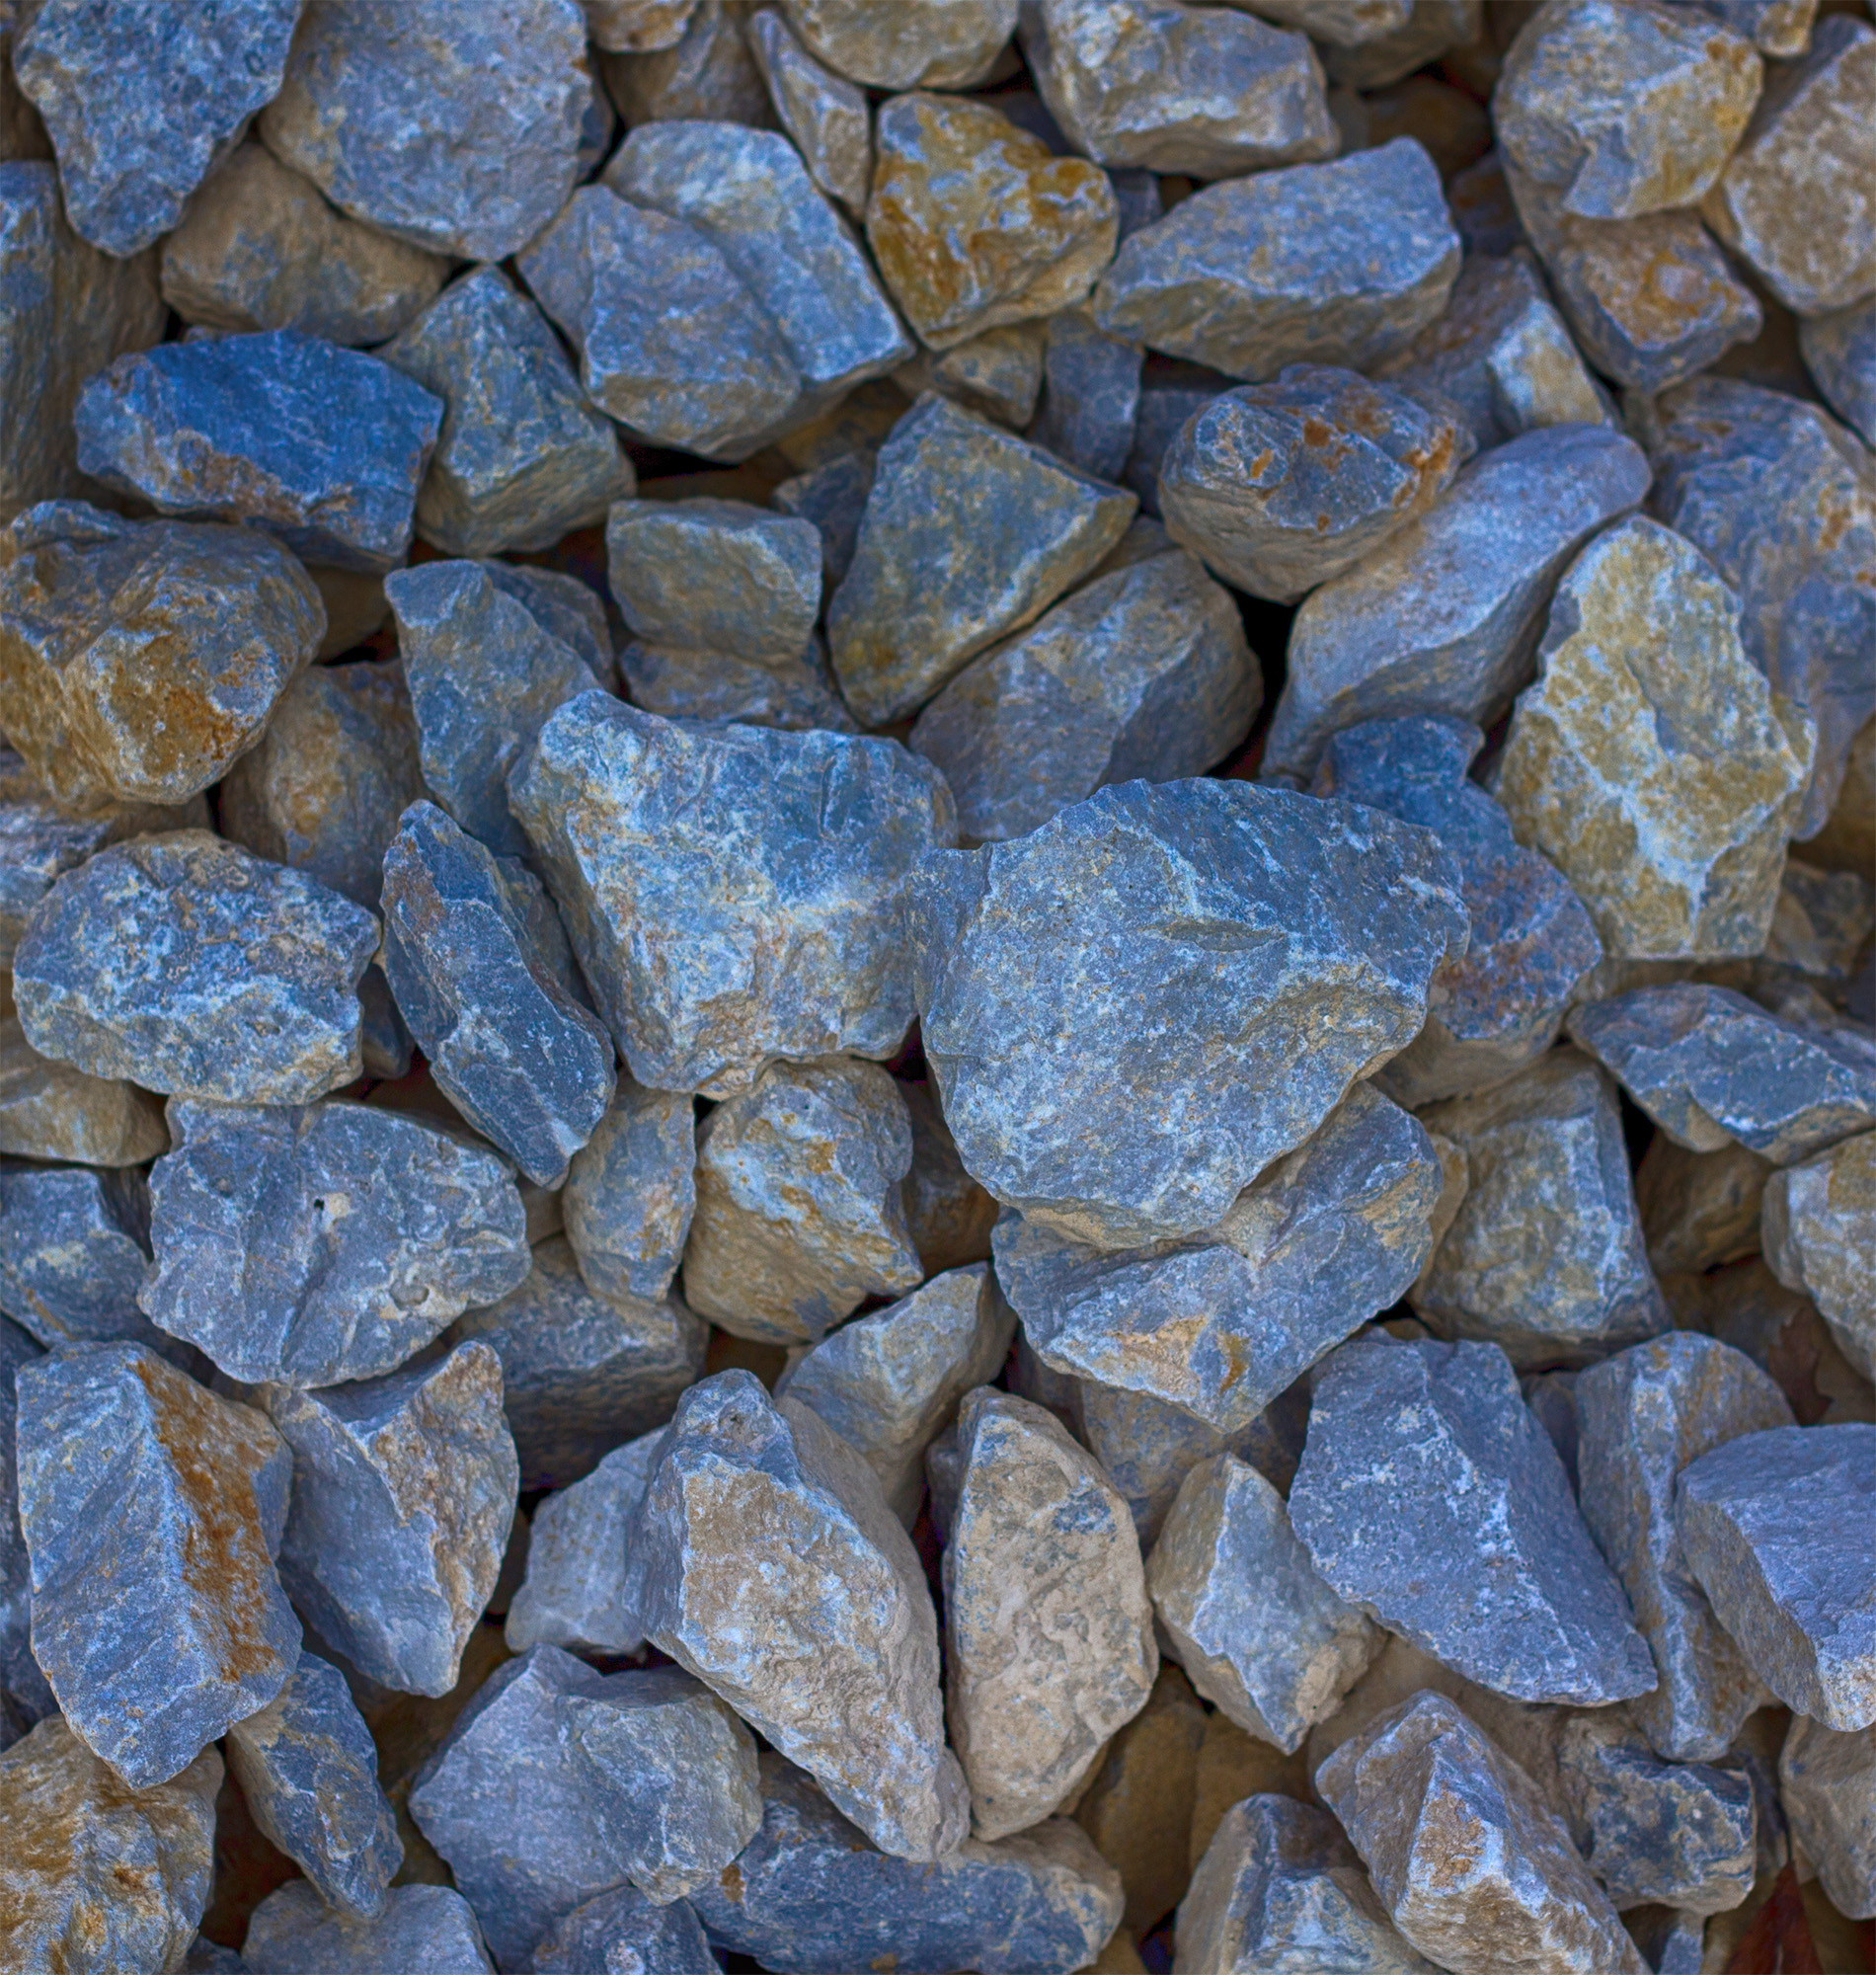 Rock pile texture